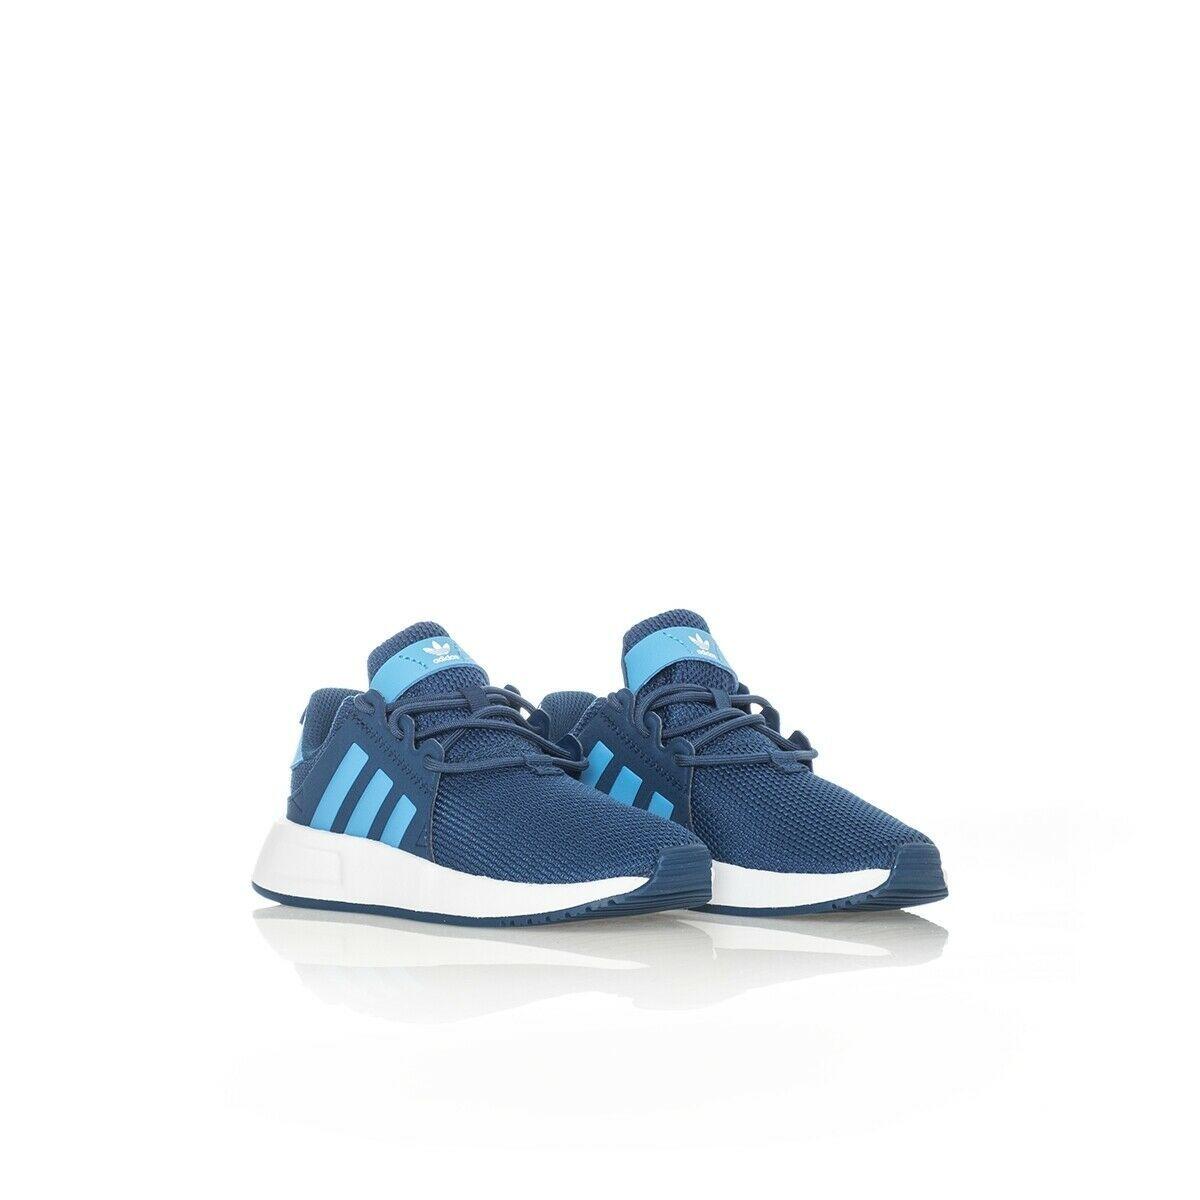 SNEAKERS KID ADIDAS X-PLR C CG6831  BLUE